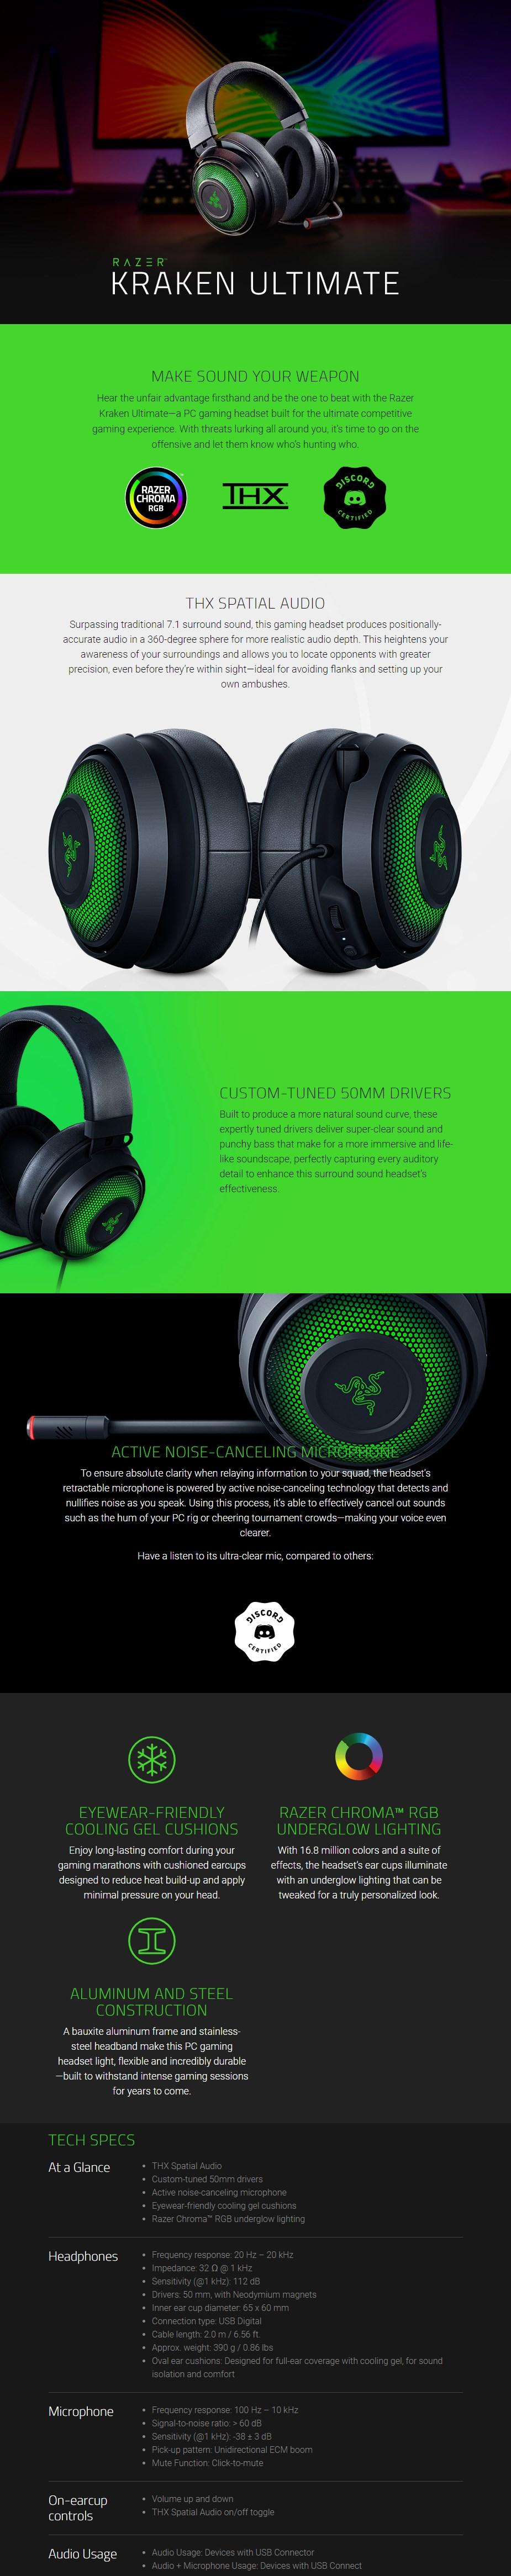 Razer Kraken Ultimate USB Surround Sound Chroma Gaming Headset - Overview 1